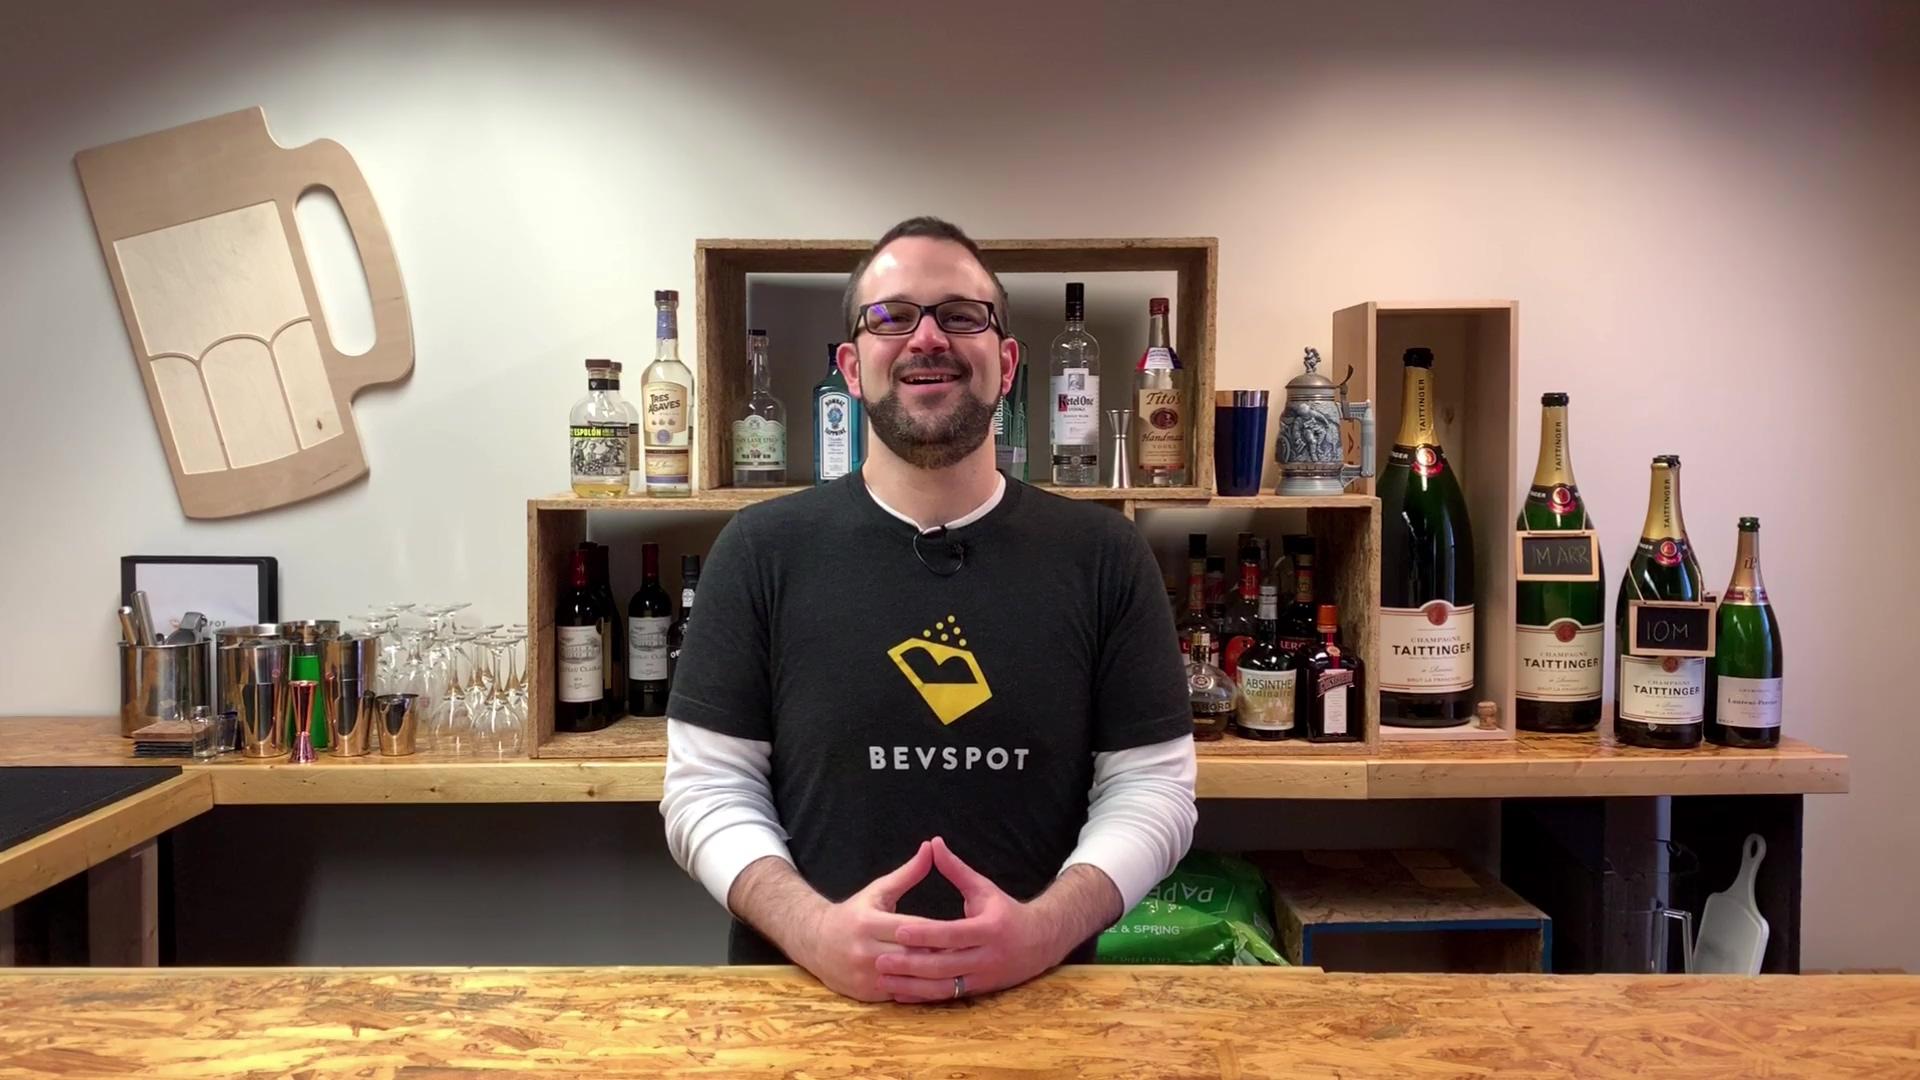 2MT - Impress Your Bar Manager